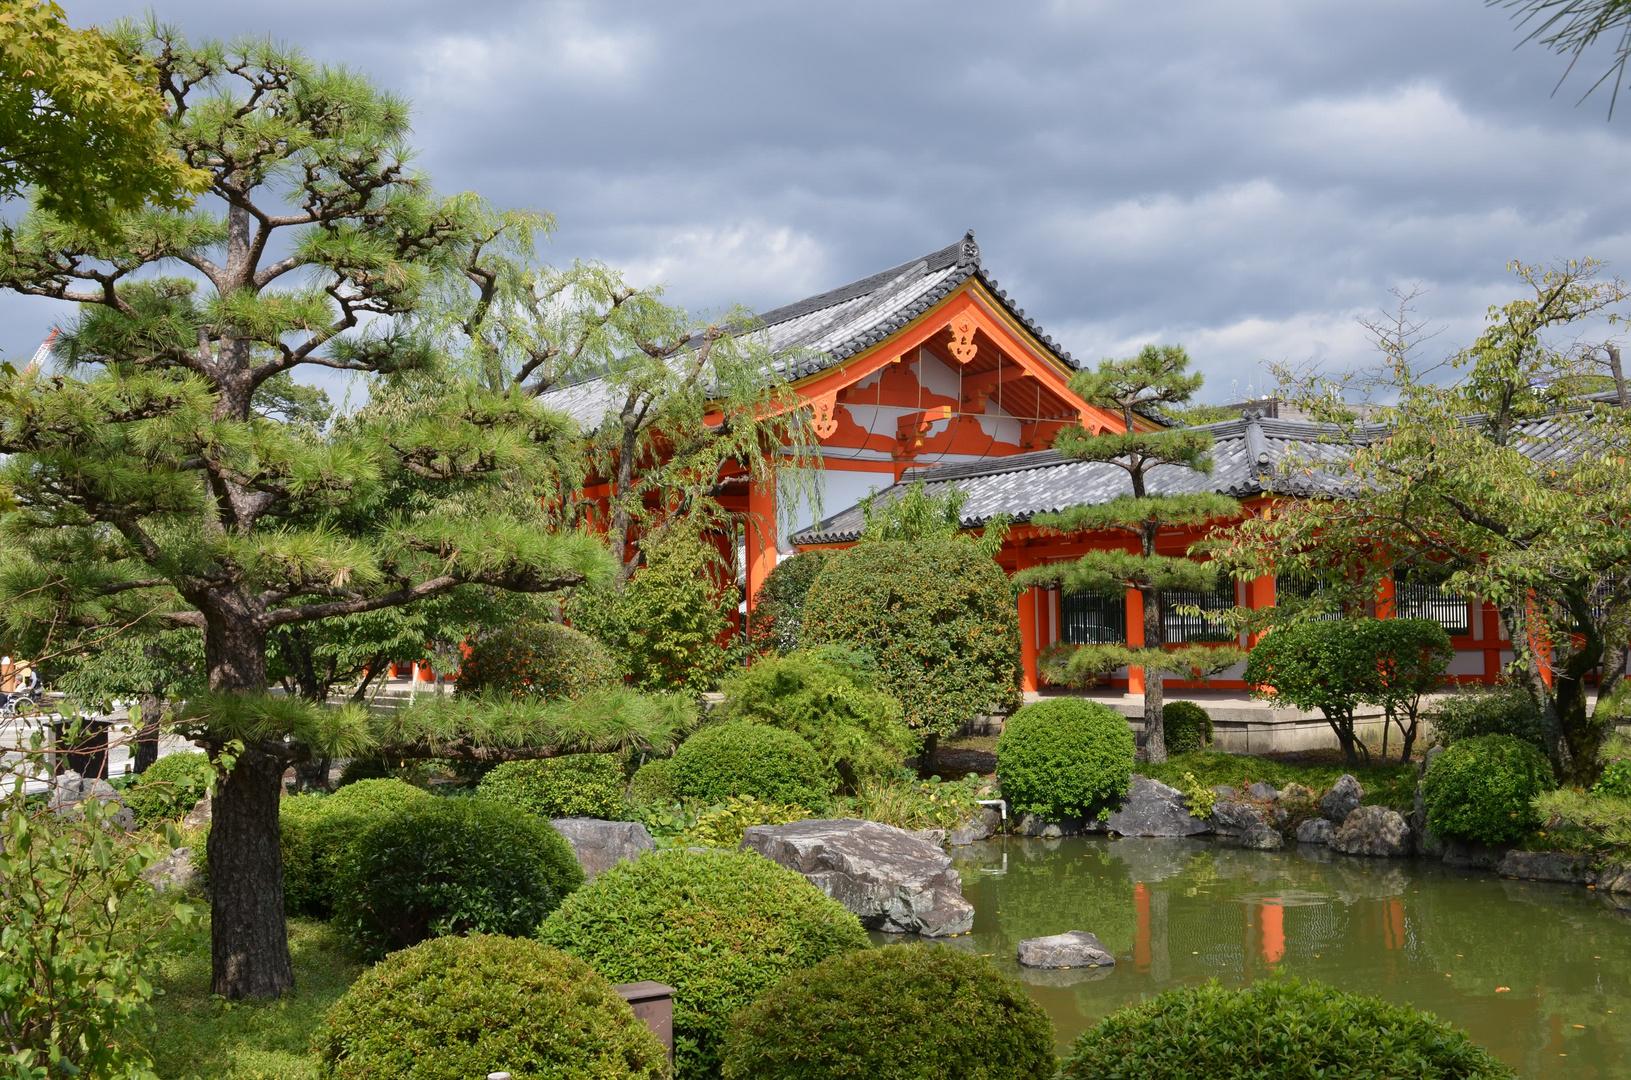 Kyoto Garden Scenery